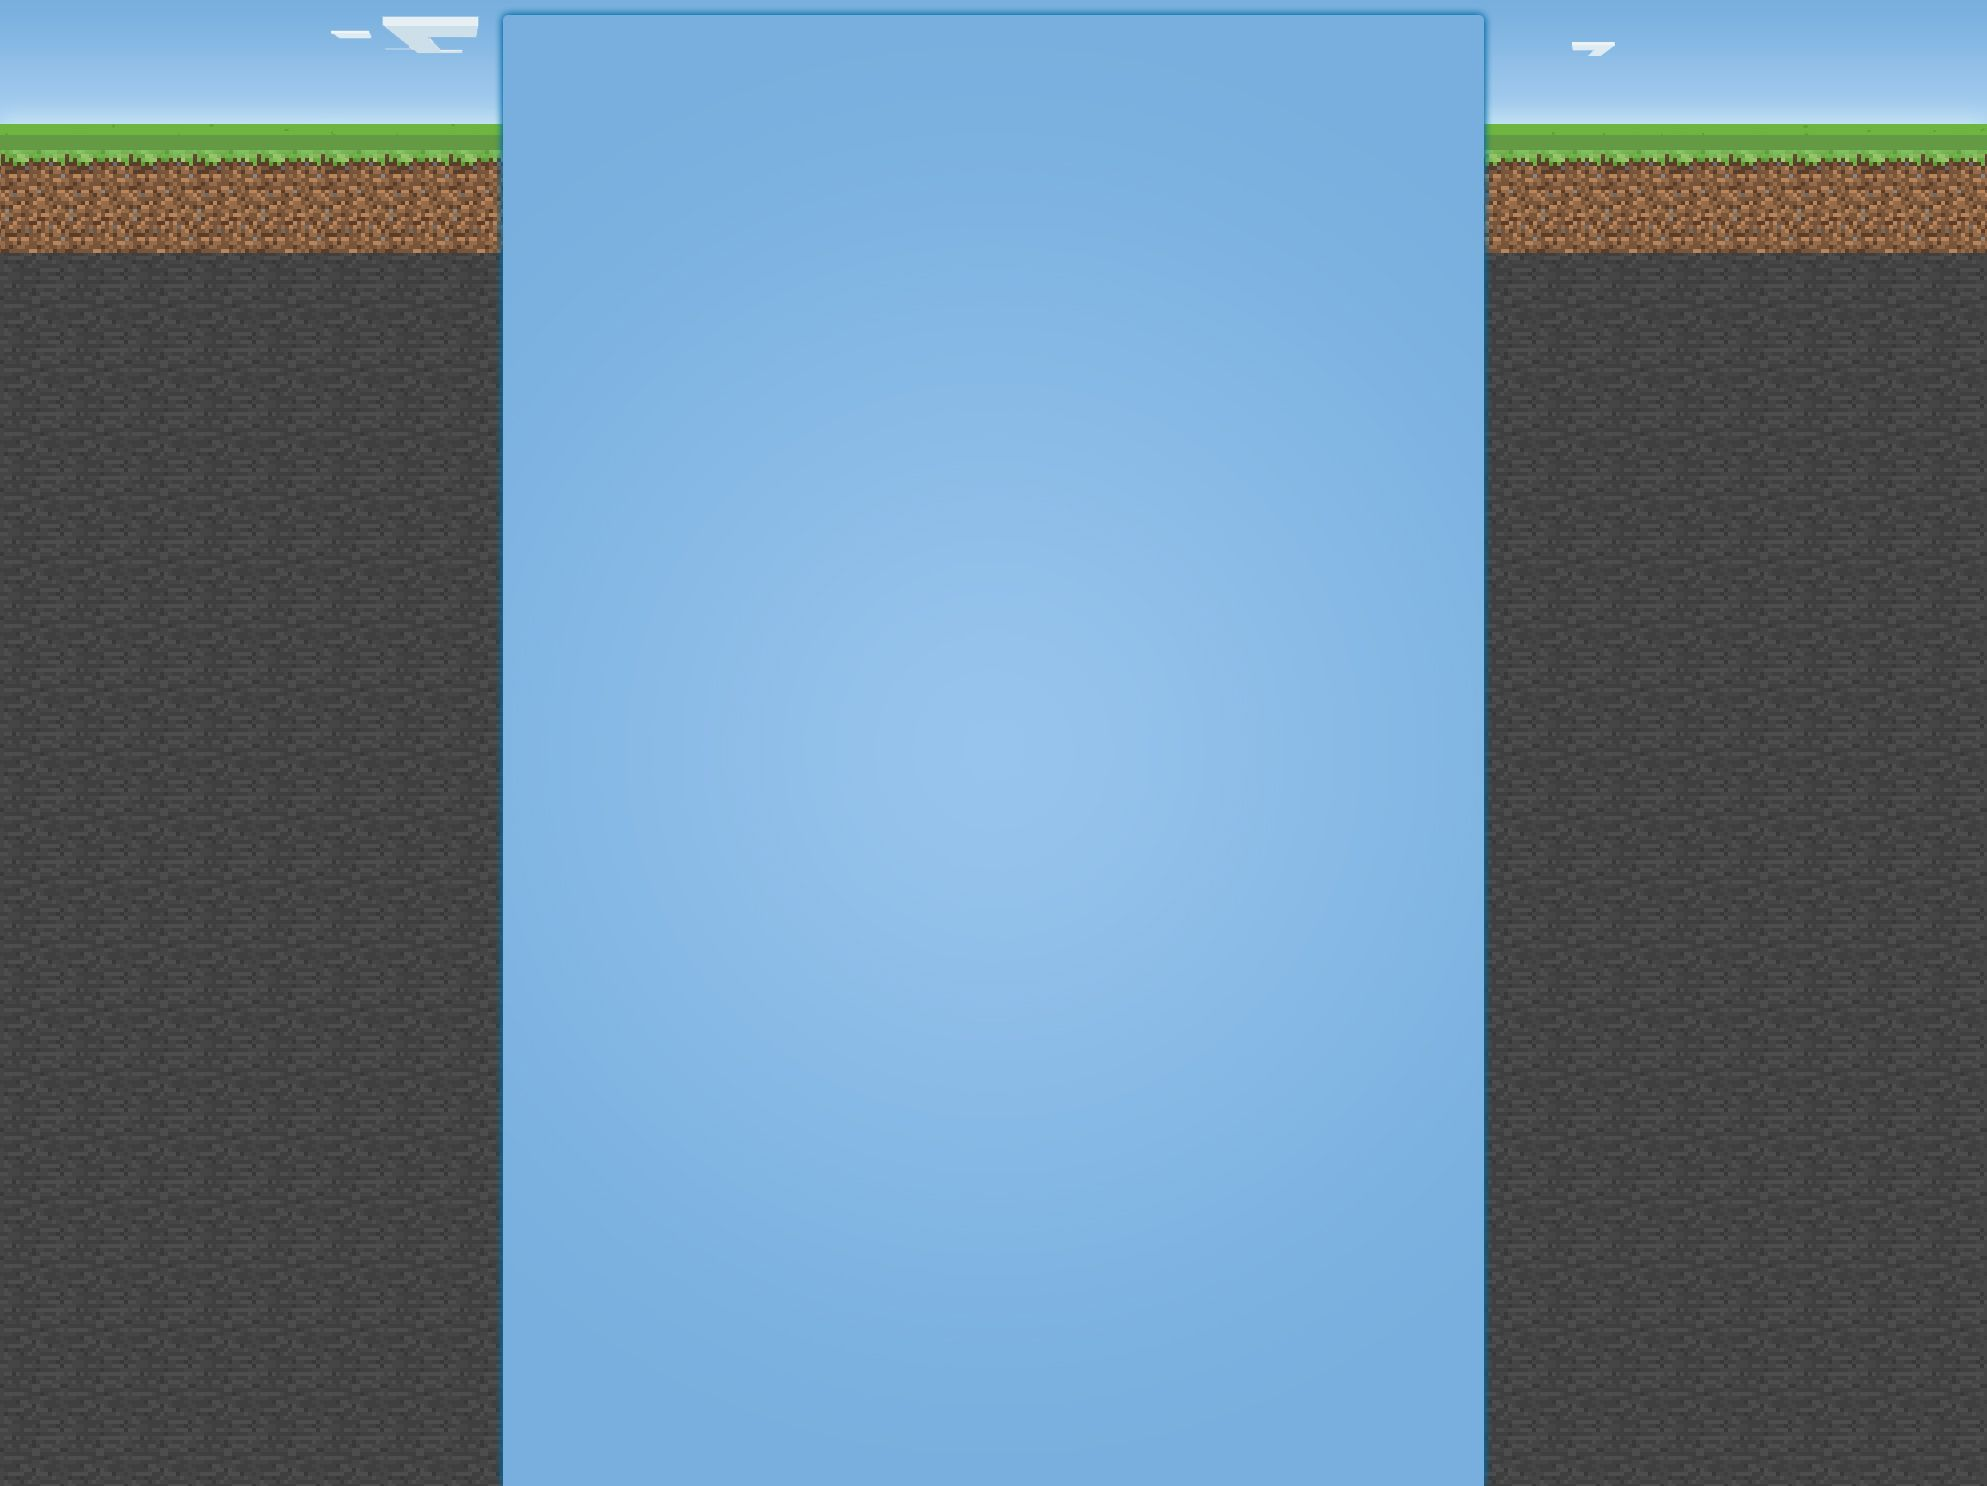 Top Wallpaper Minecraft Youtube - b13dbe71e9ffde55613544180f8b7ec2  Collection_142187.jpg